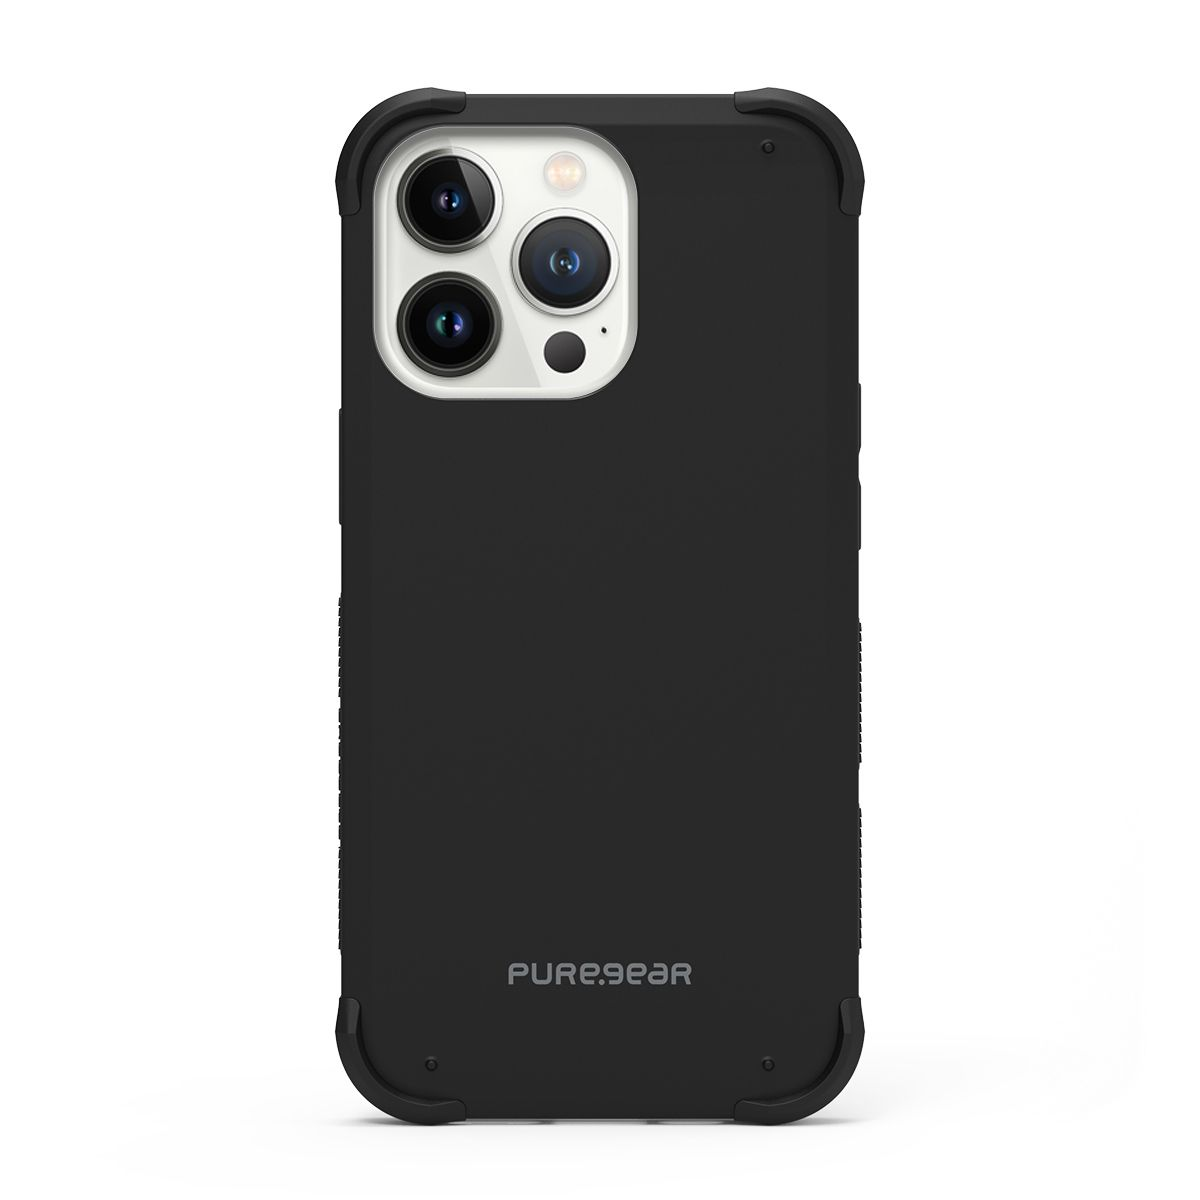 Apple iPhone 13 Pro Dualtek - Nightfall